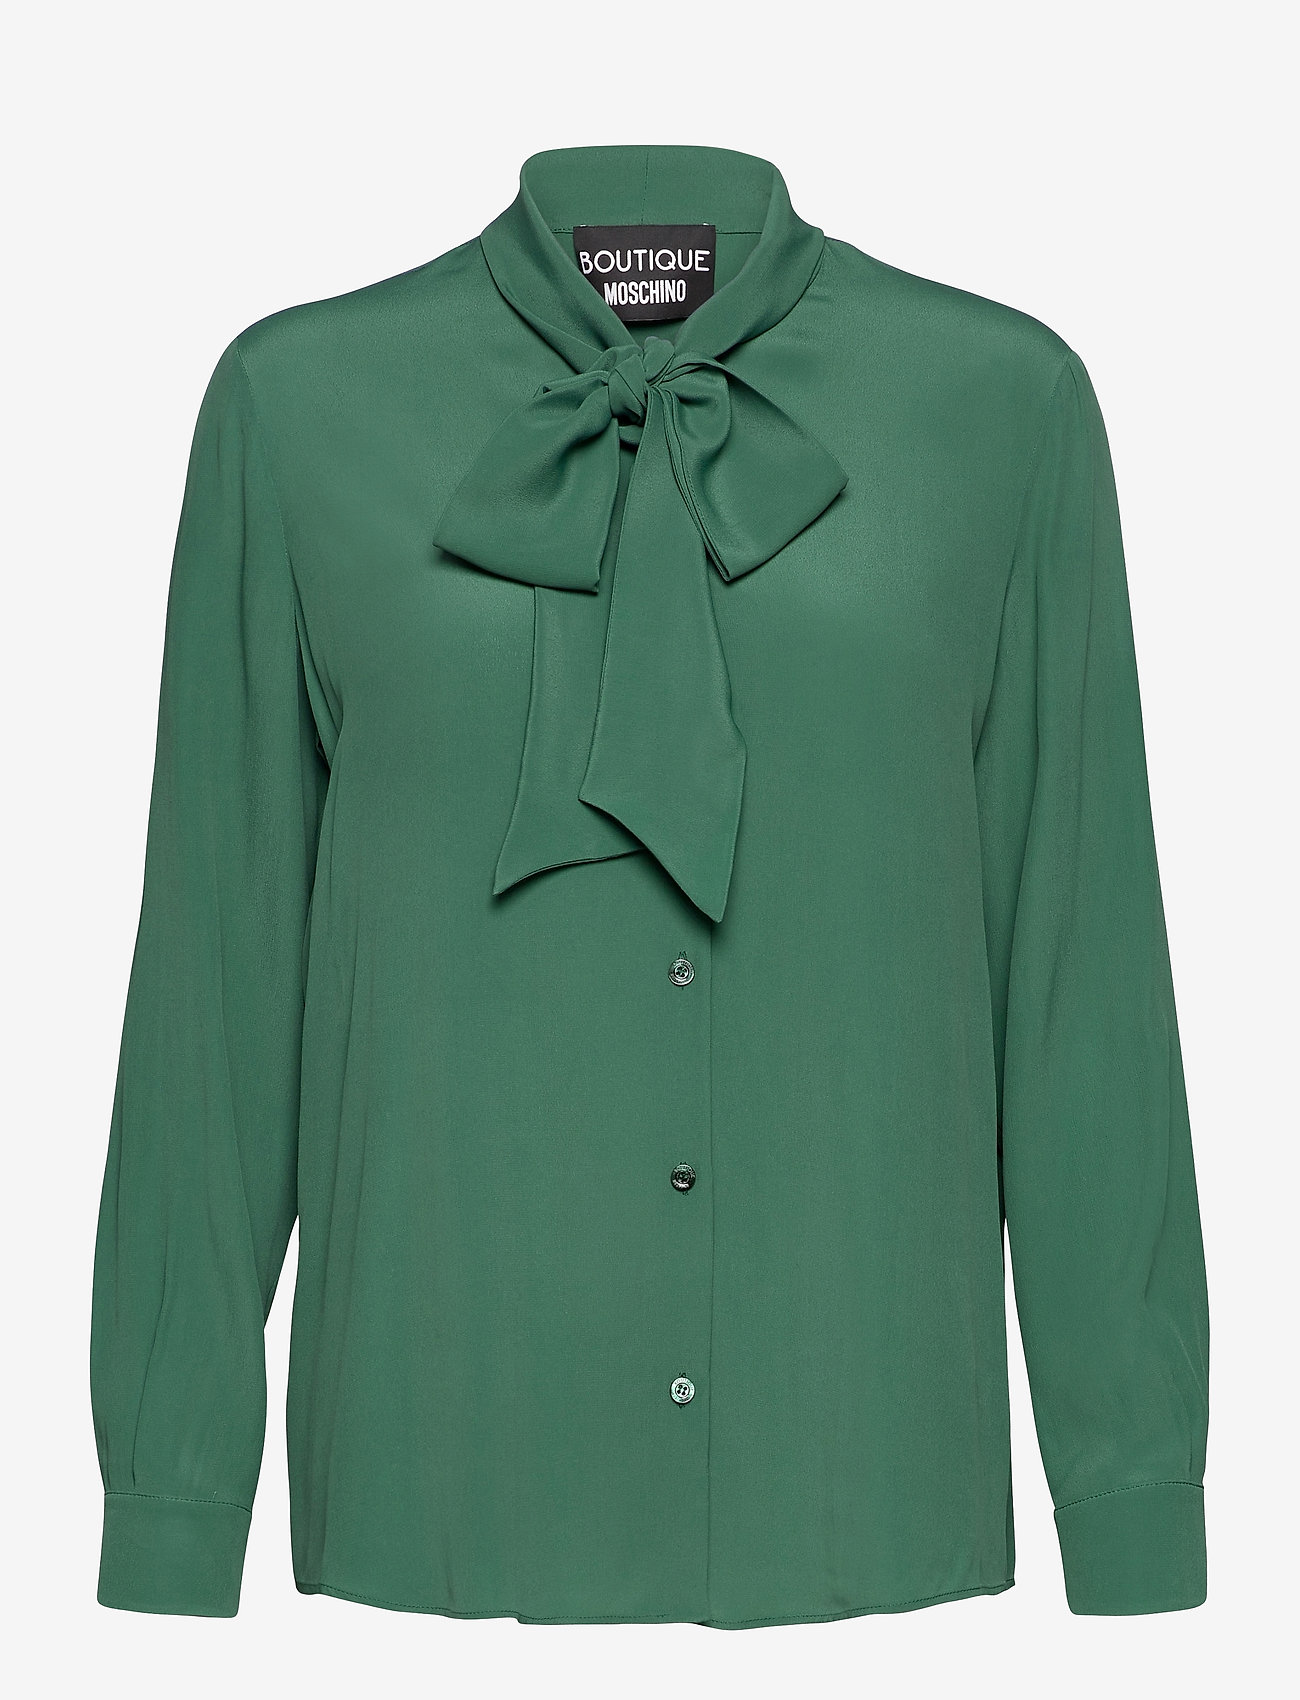 Boutique Moschino - Boutique Moschino BLOUSE - langærmede bluser - green - 0